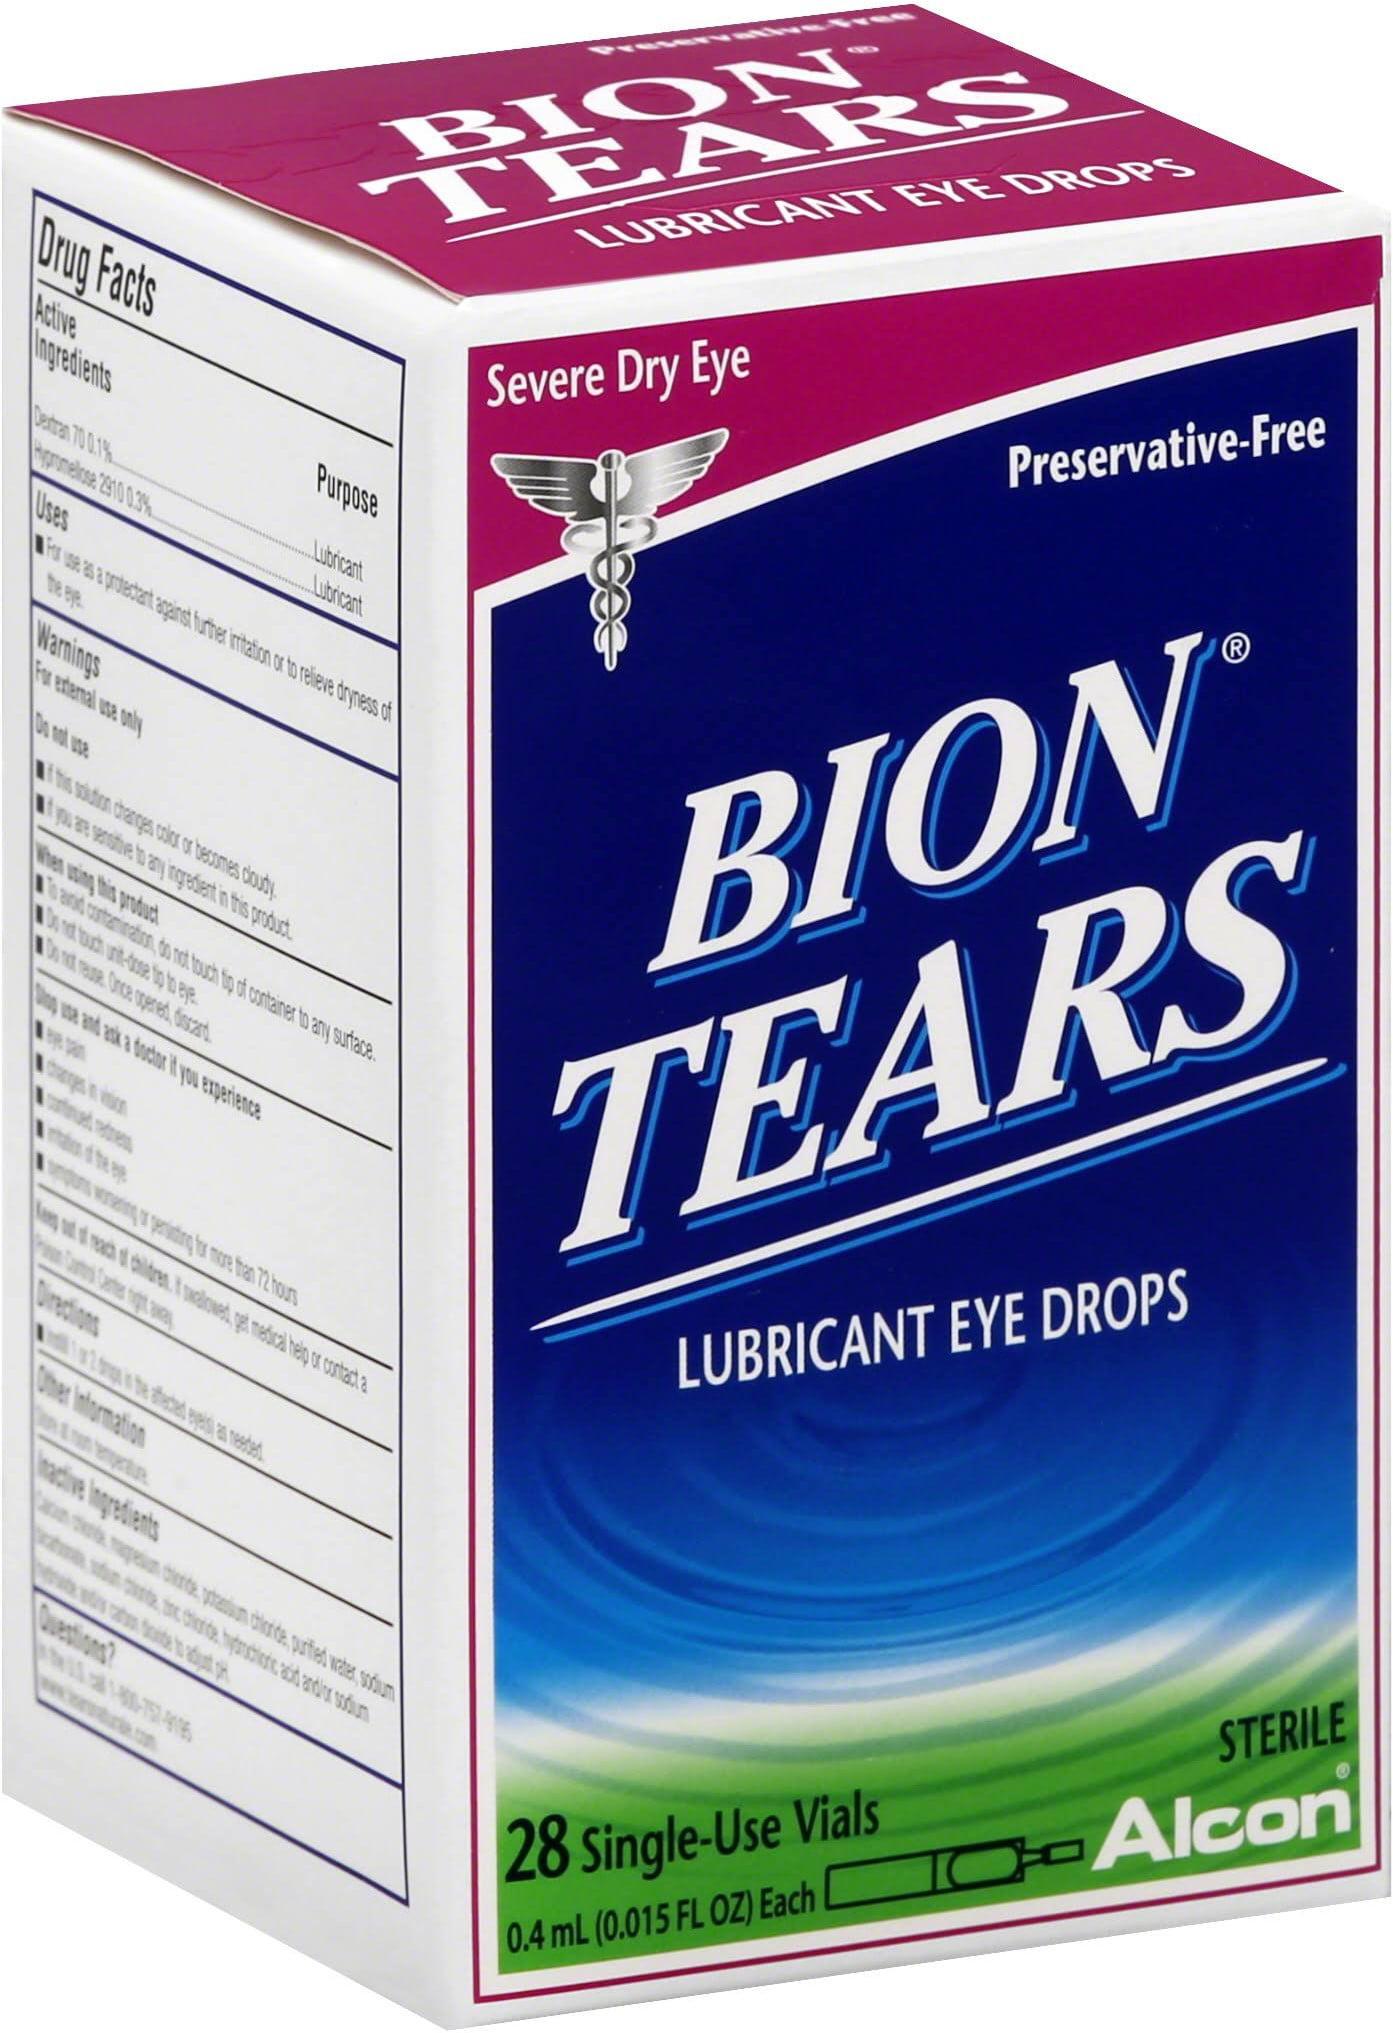 Bion Tears Lubricant Eye Drops Single Use Vials 28 Ea Pack Of 4 Walmart Com Walmart Com